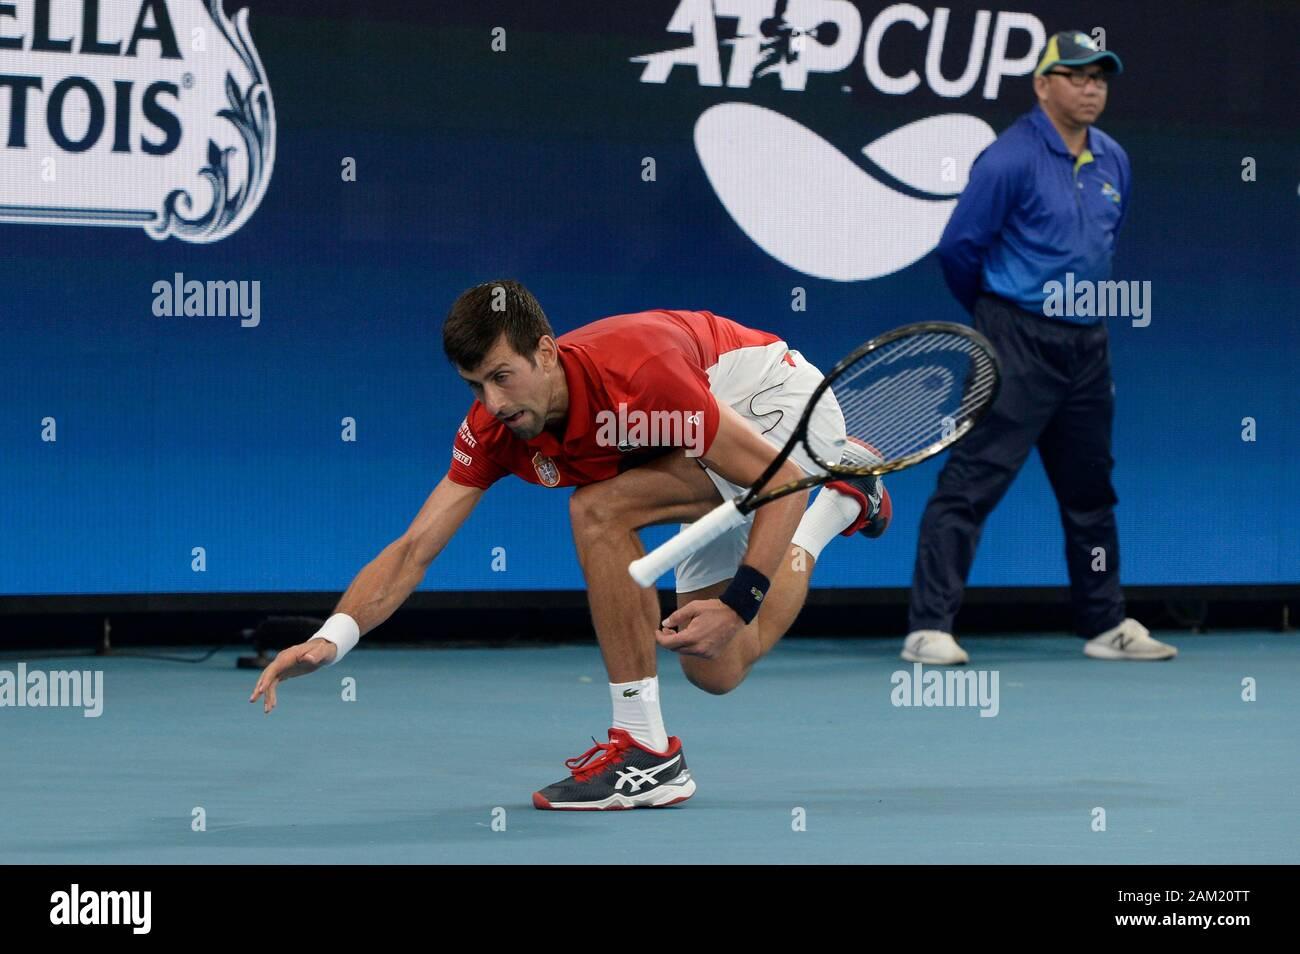 Novak Djokovic Grip High Resolution Stock Photography And Images Alamy